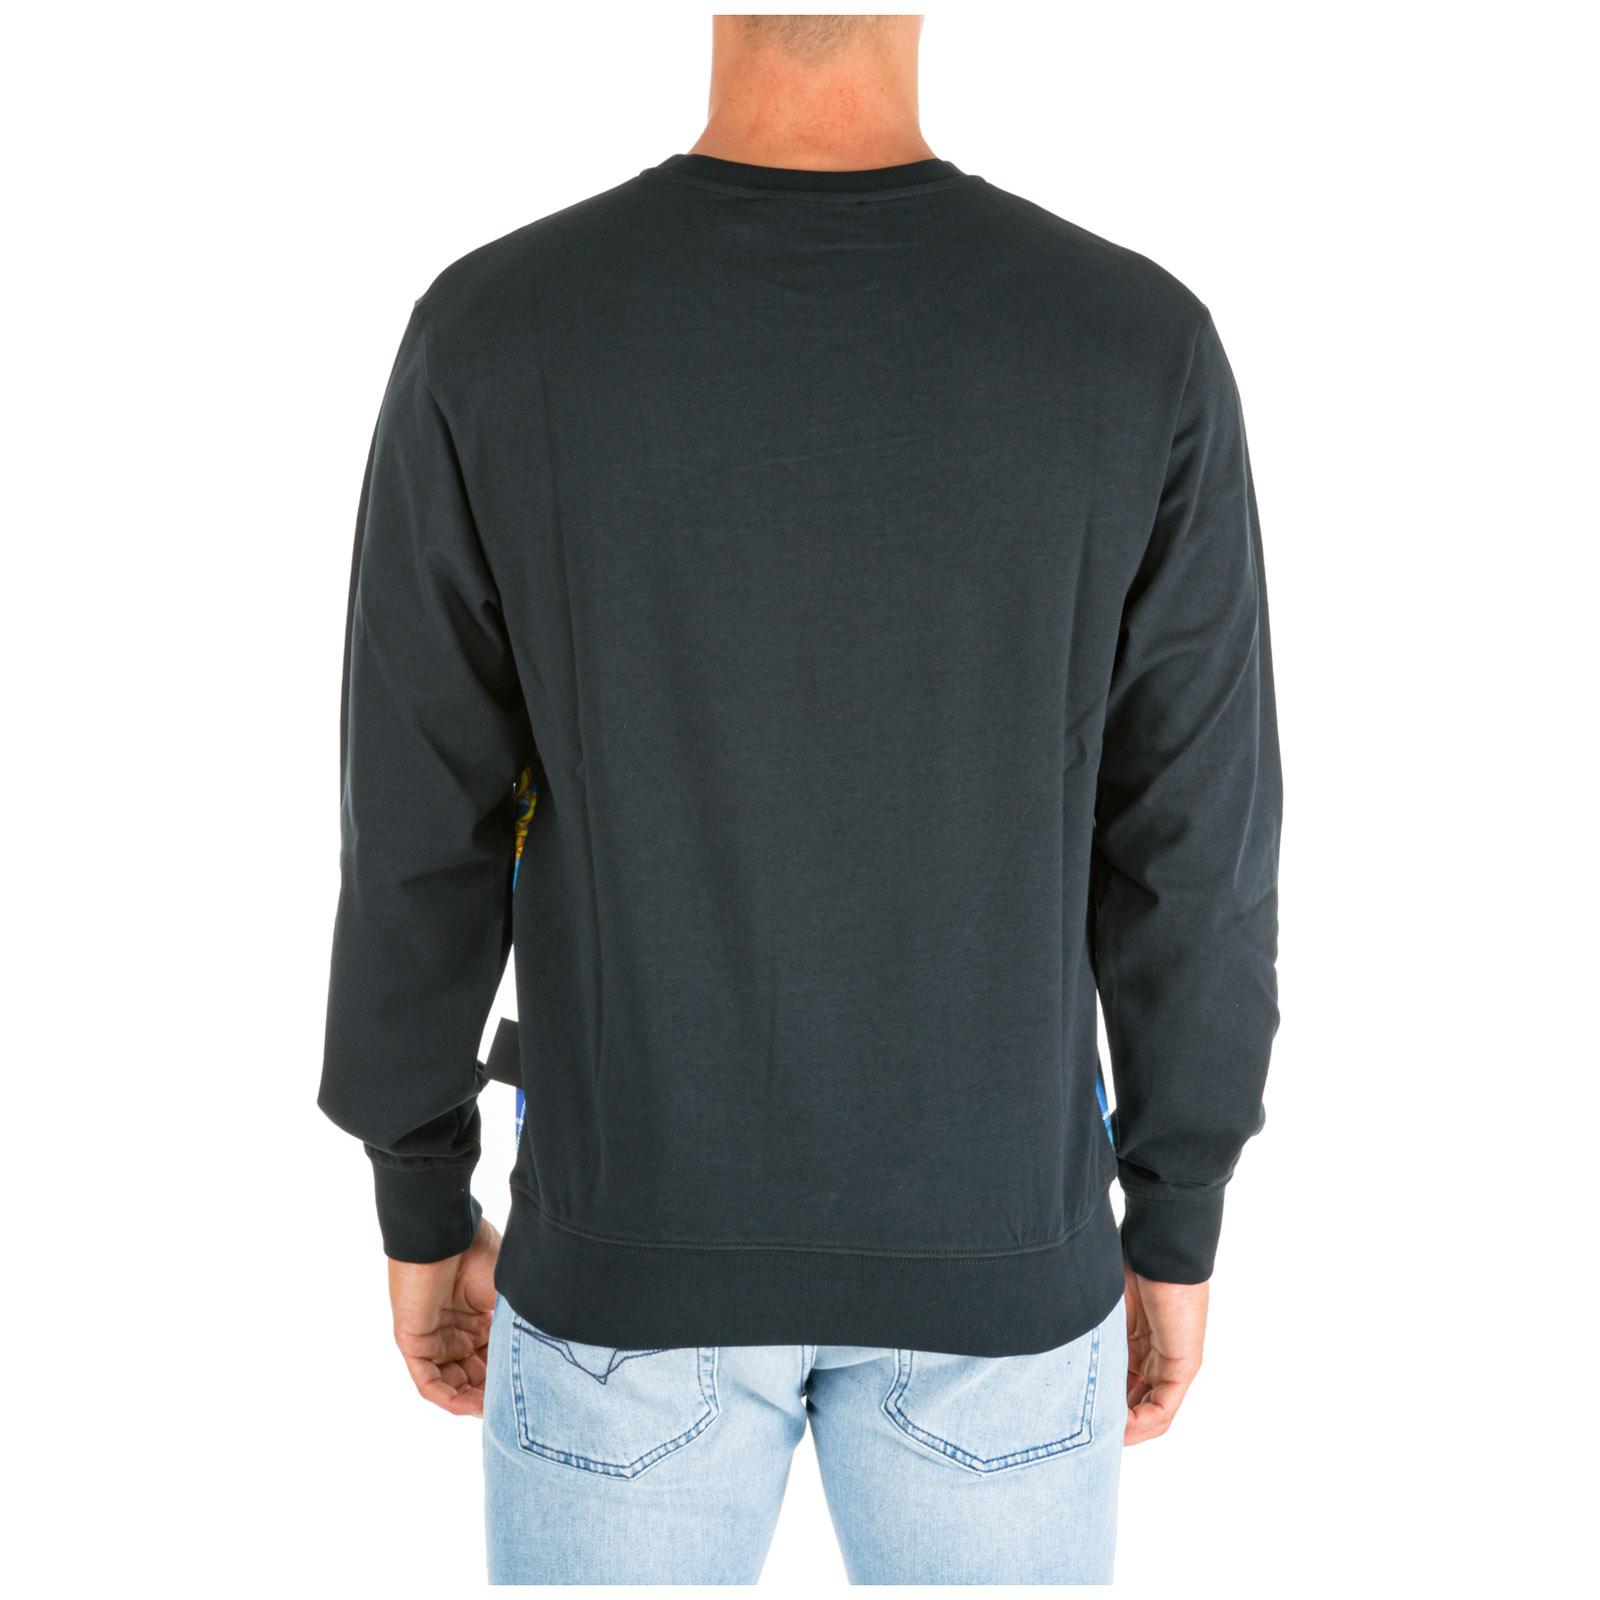 4236e9c6128 Men's sweatshirt sweat check baroque